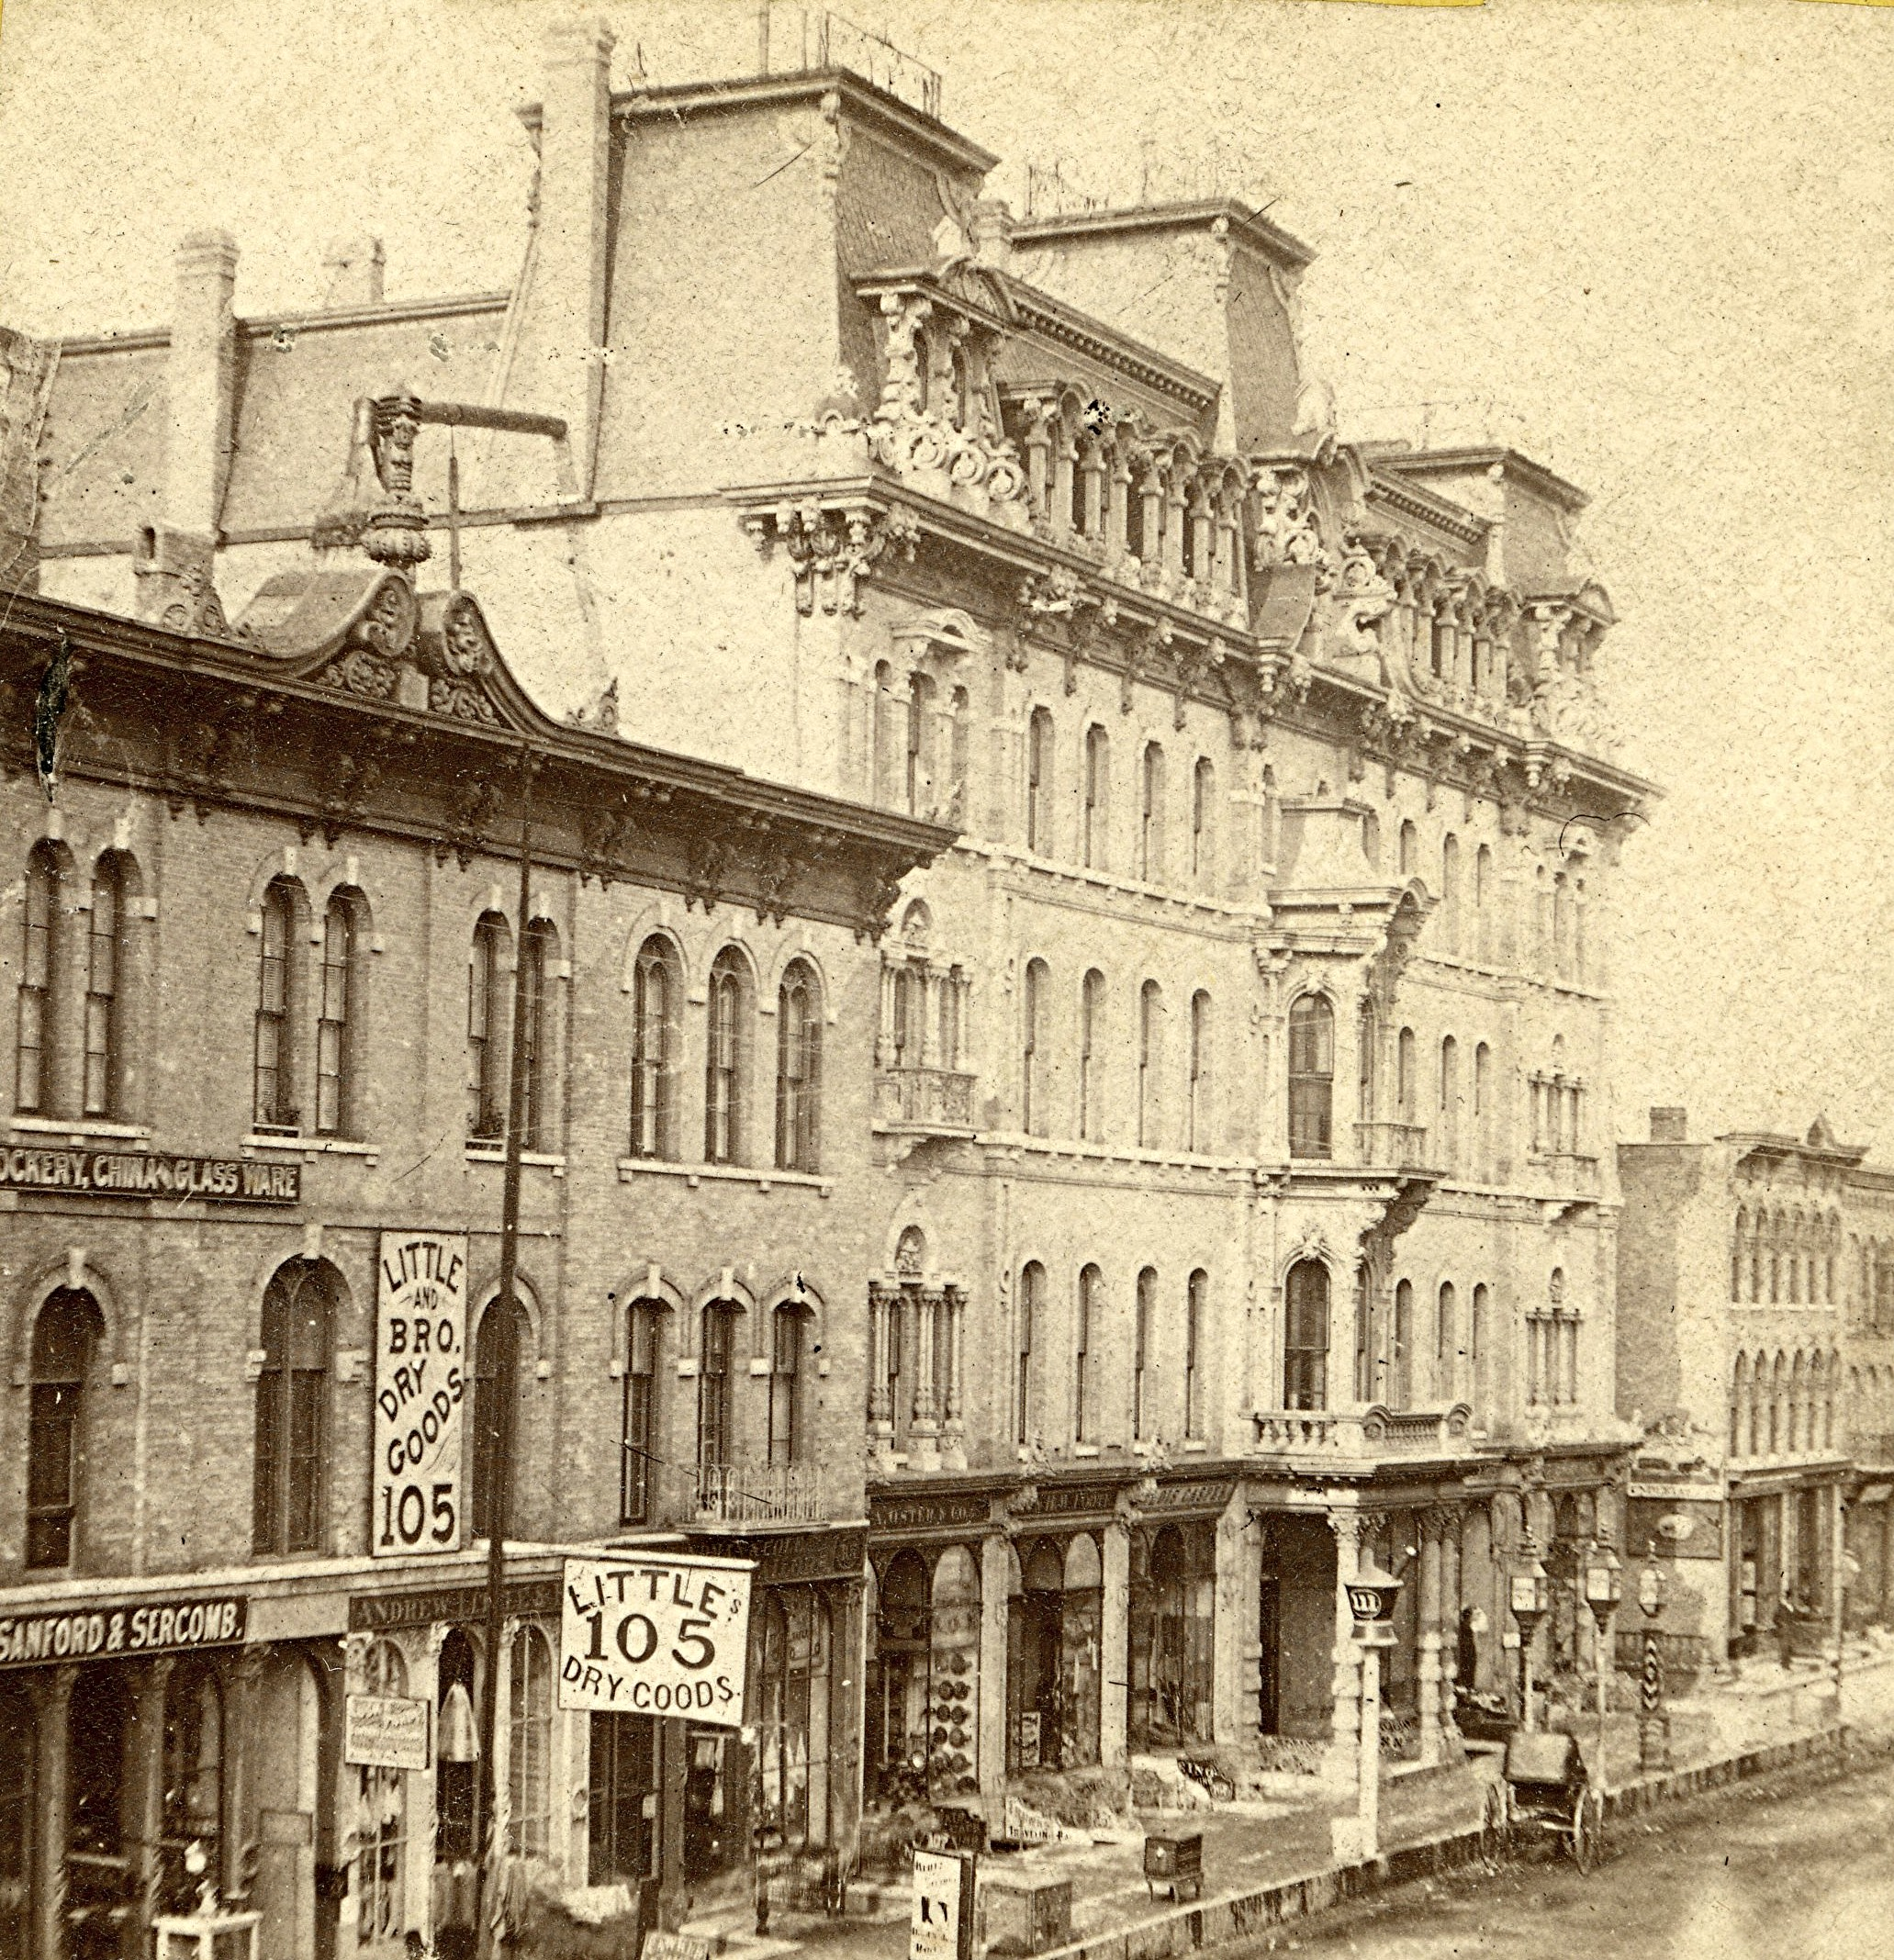 Plankinton House Hotel